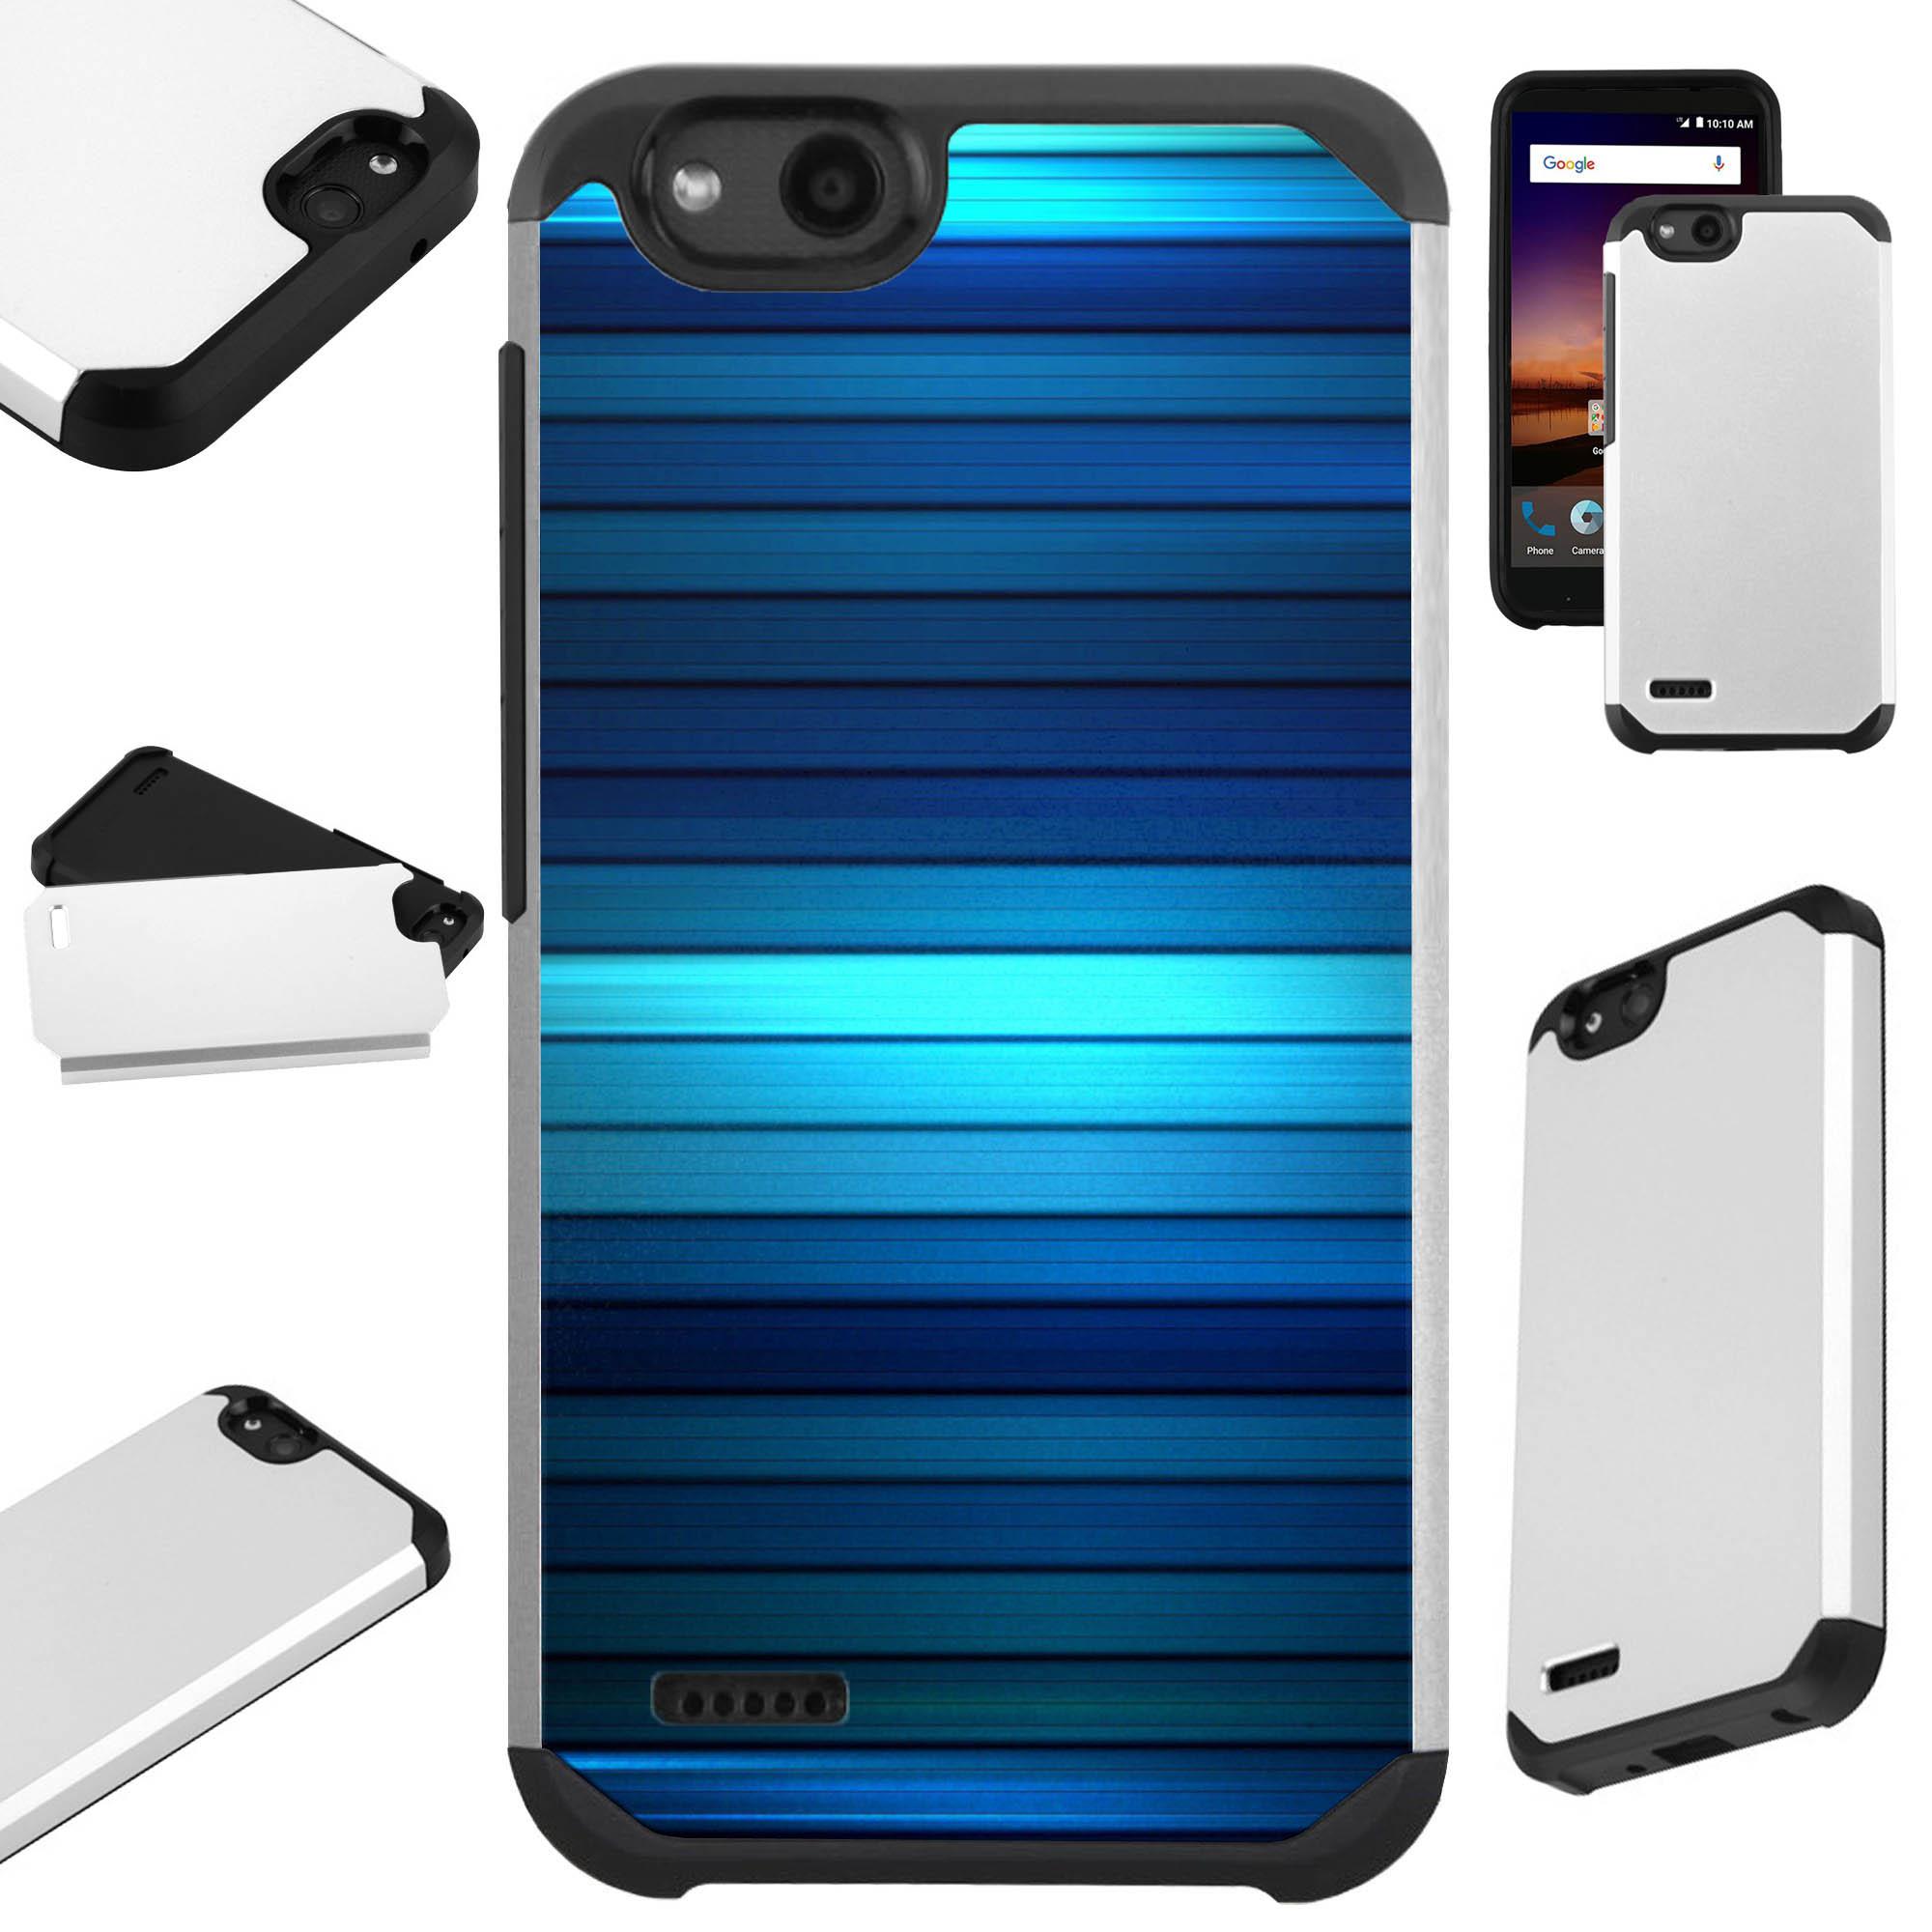 For ZTE ZFive G LTE / ZFive C / Avid 4 / Fanfare 3 / Blade Vantage / Tempo X / Tempo Go Case Hybrid TPU Fusion Phone Cover (Blue Fence)